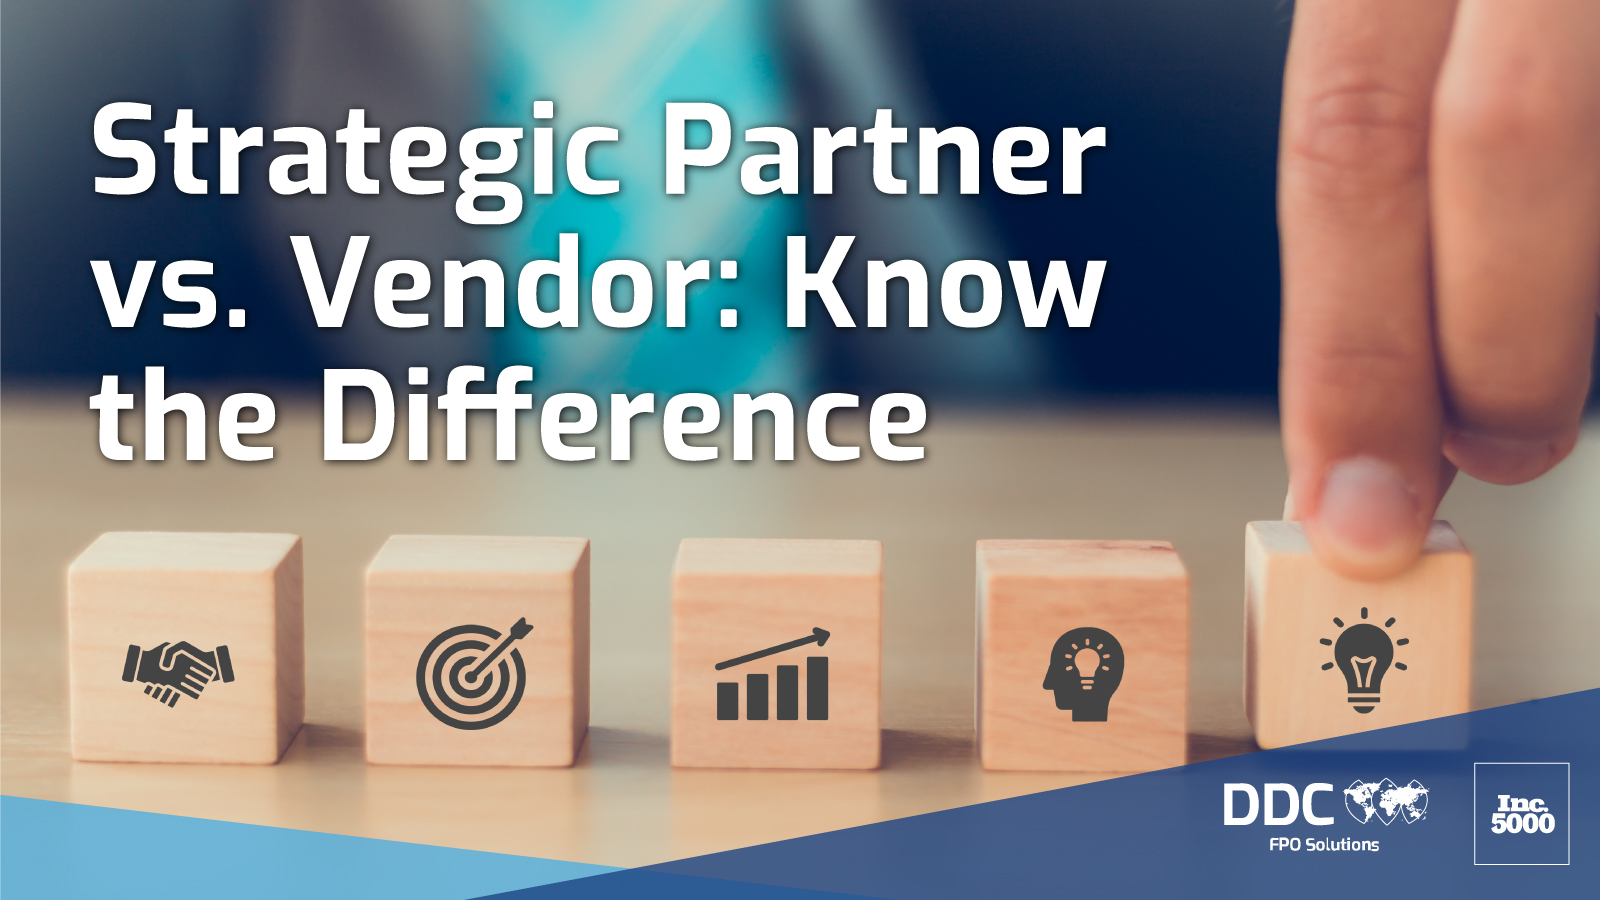 Strategic Partner vs. Vendor: Know the Difference